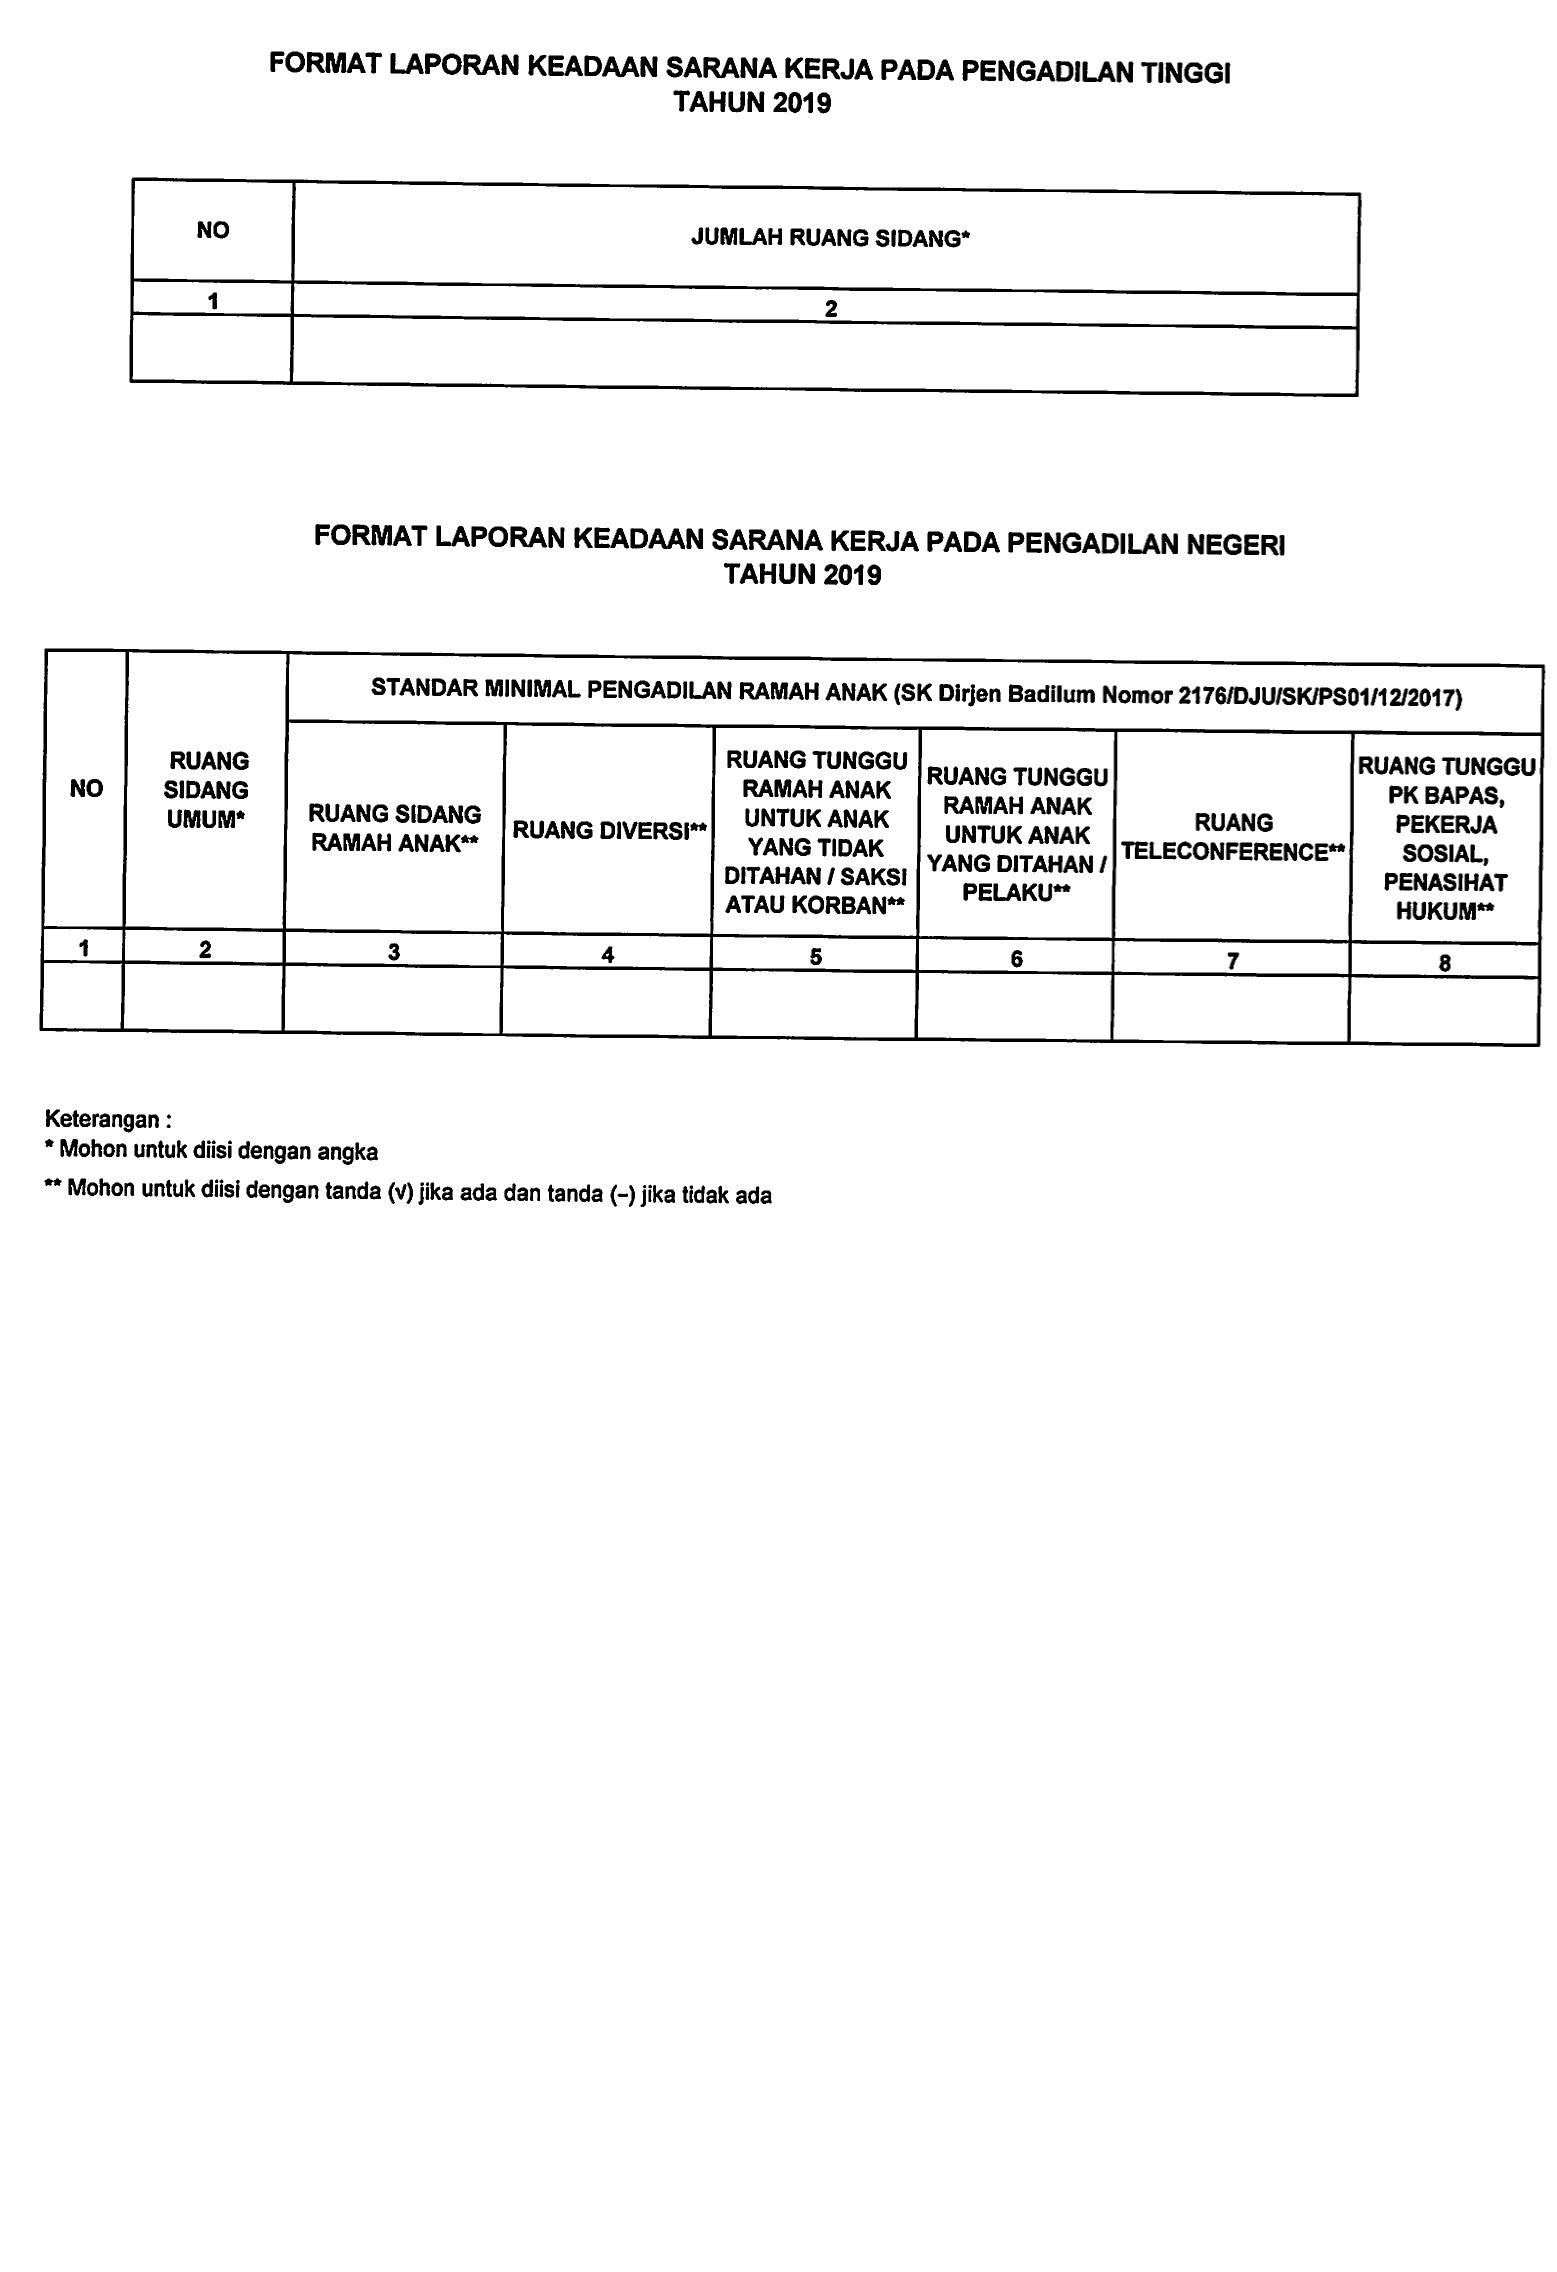 Copy of sarpras 12 aa7de